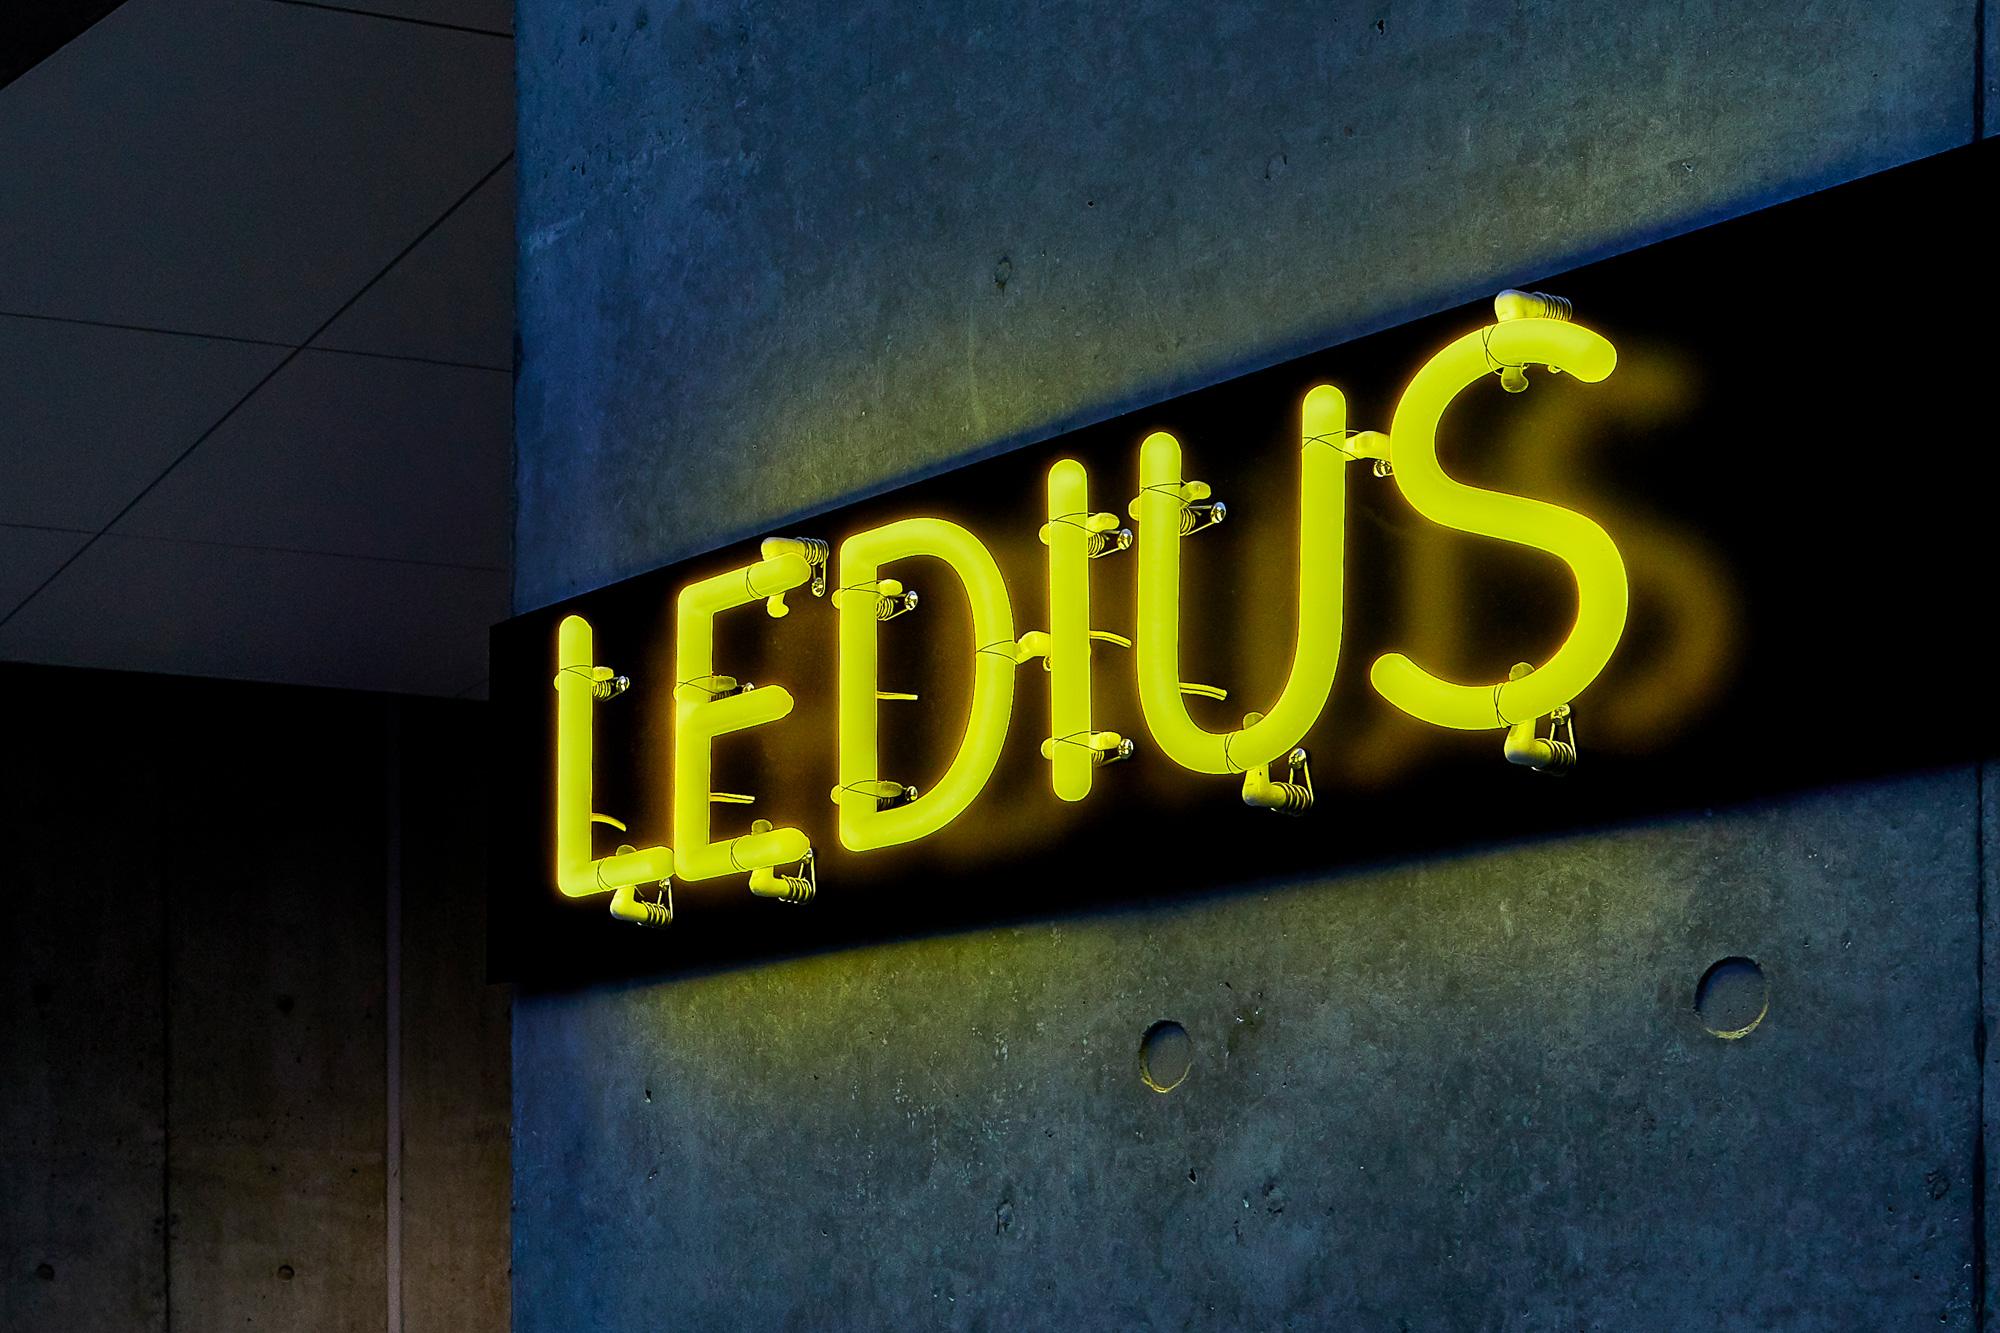 LEDIUS SIGNで表現された最近のLEDサインの写真